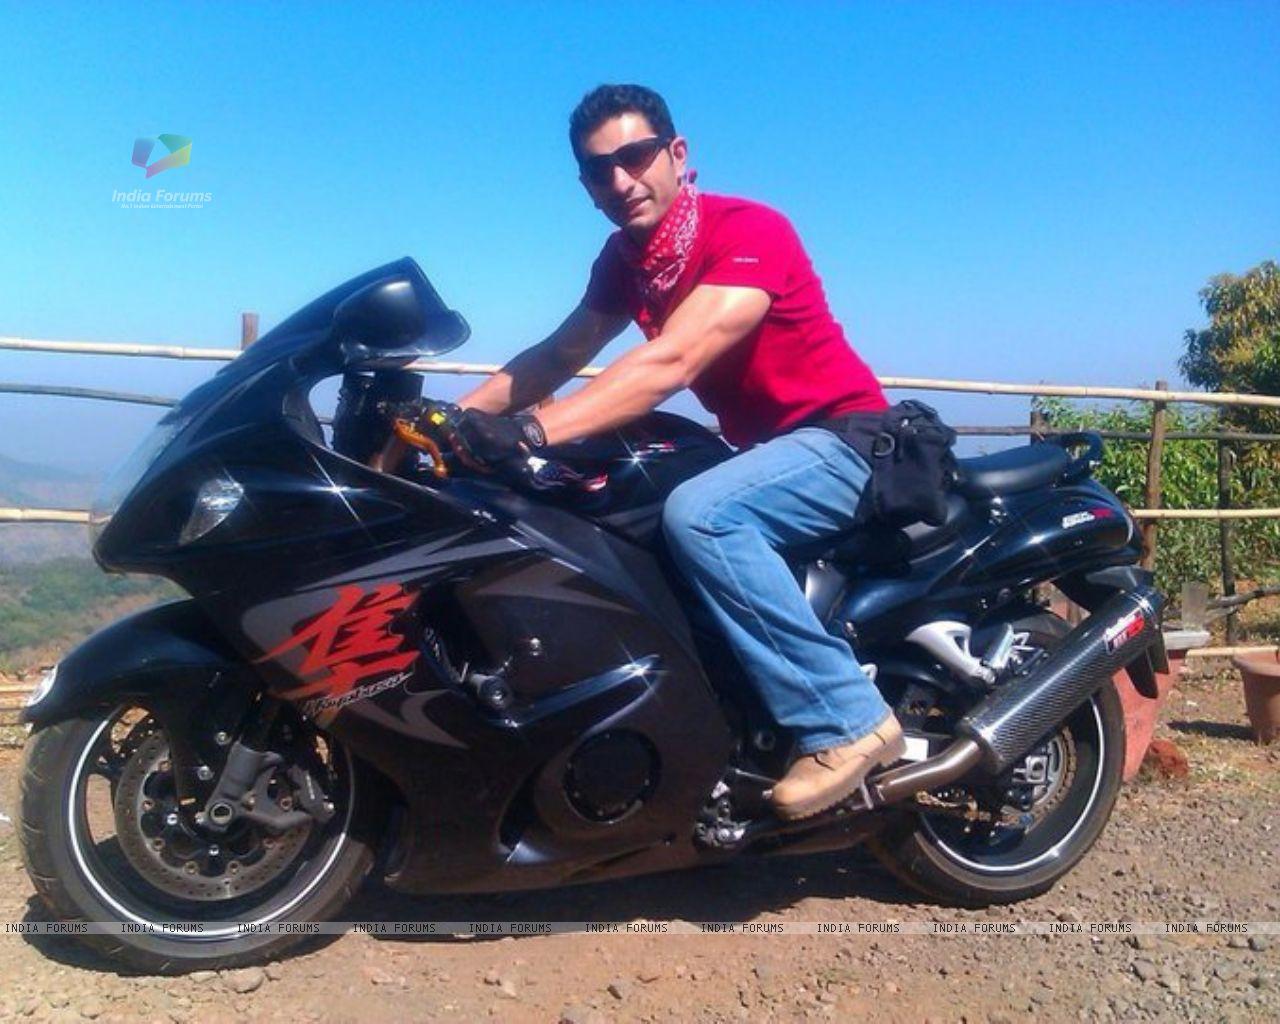 Wallpaper   Siddhant Karnick on bike 204551 size1280x1024 1280x1024